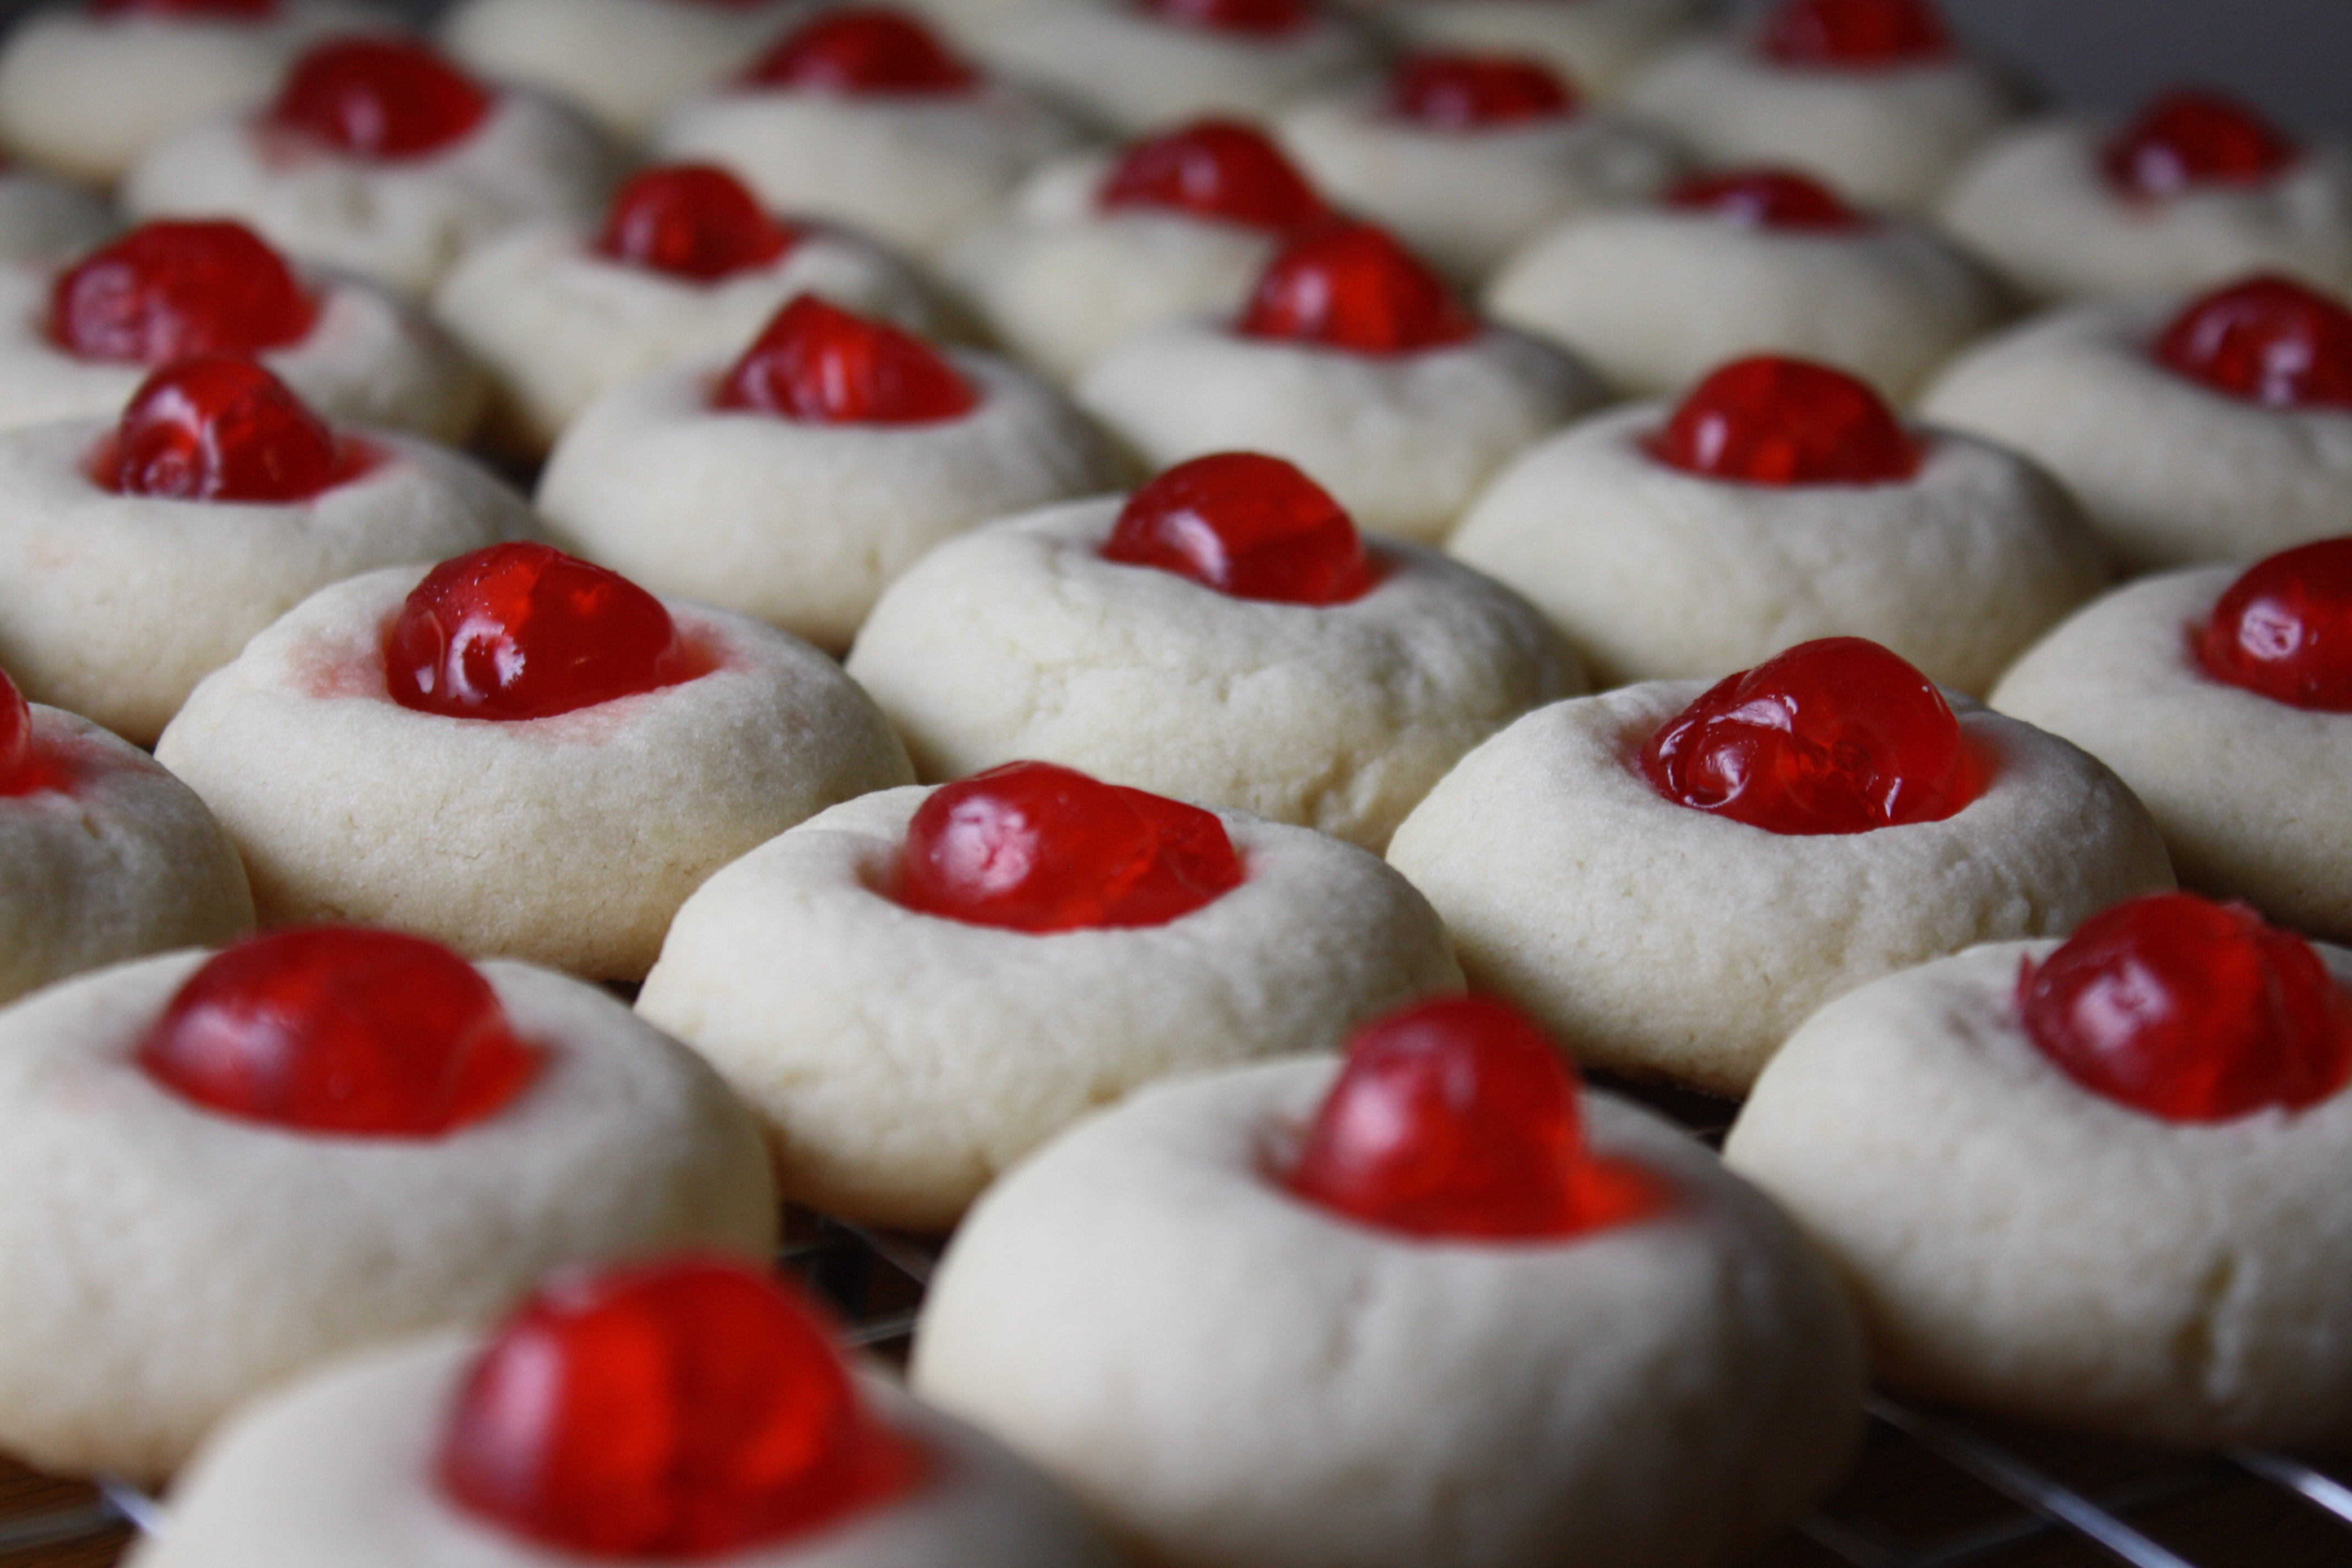 ... marashino cherries i m dubbing these little guys cherry vanilla drops